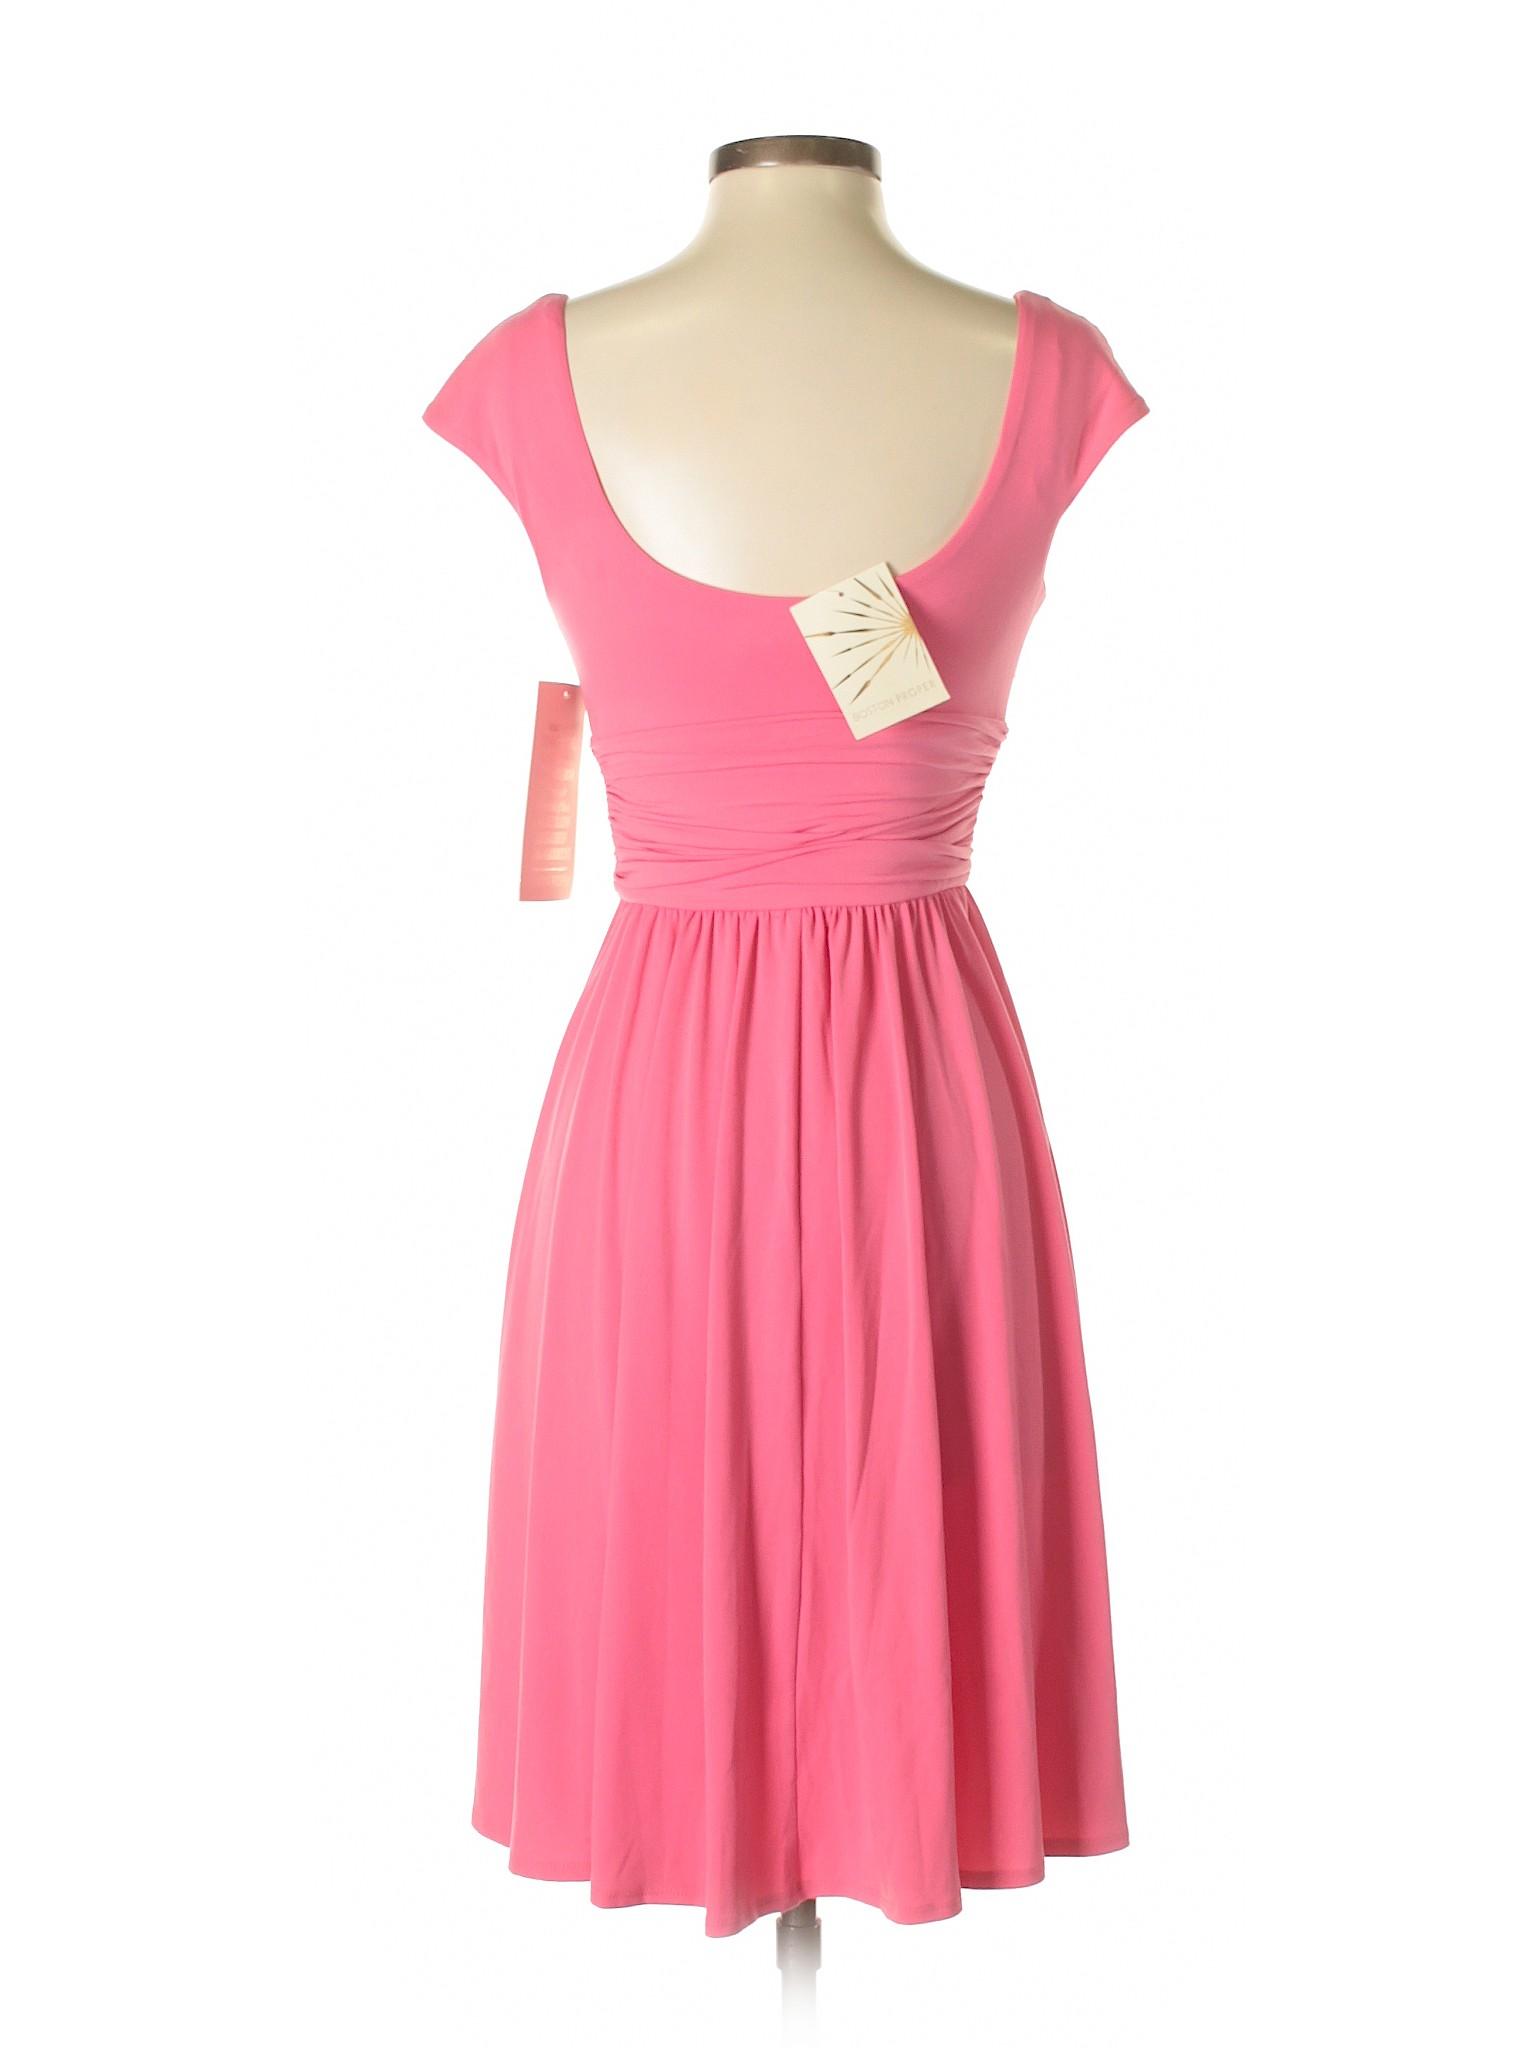 Selling Proper Casual Boston Boston Dress Proper Dress Selling Casual vTxvYCqwr